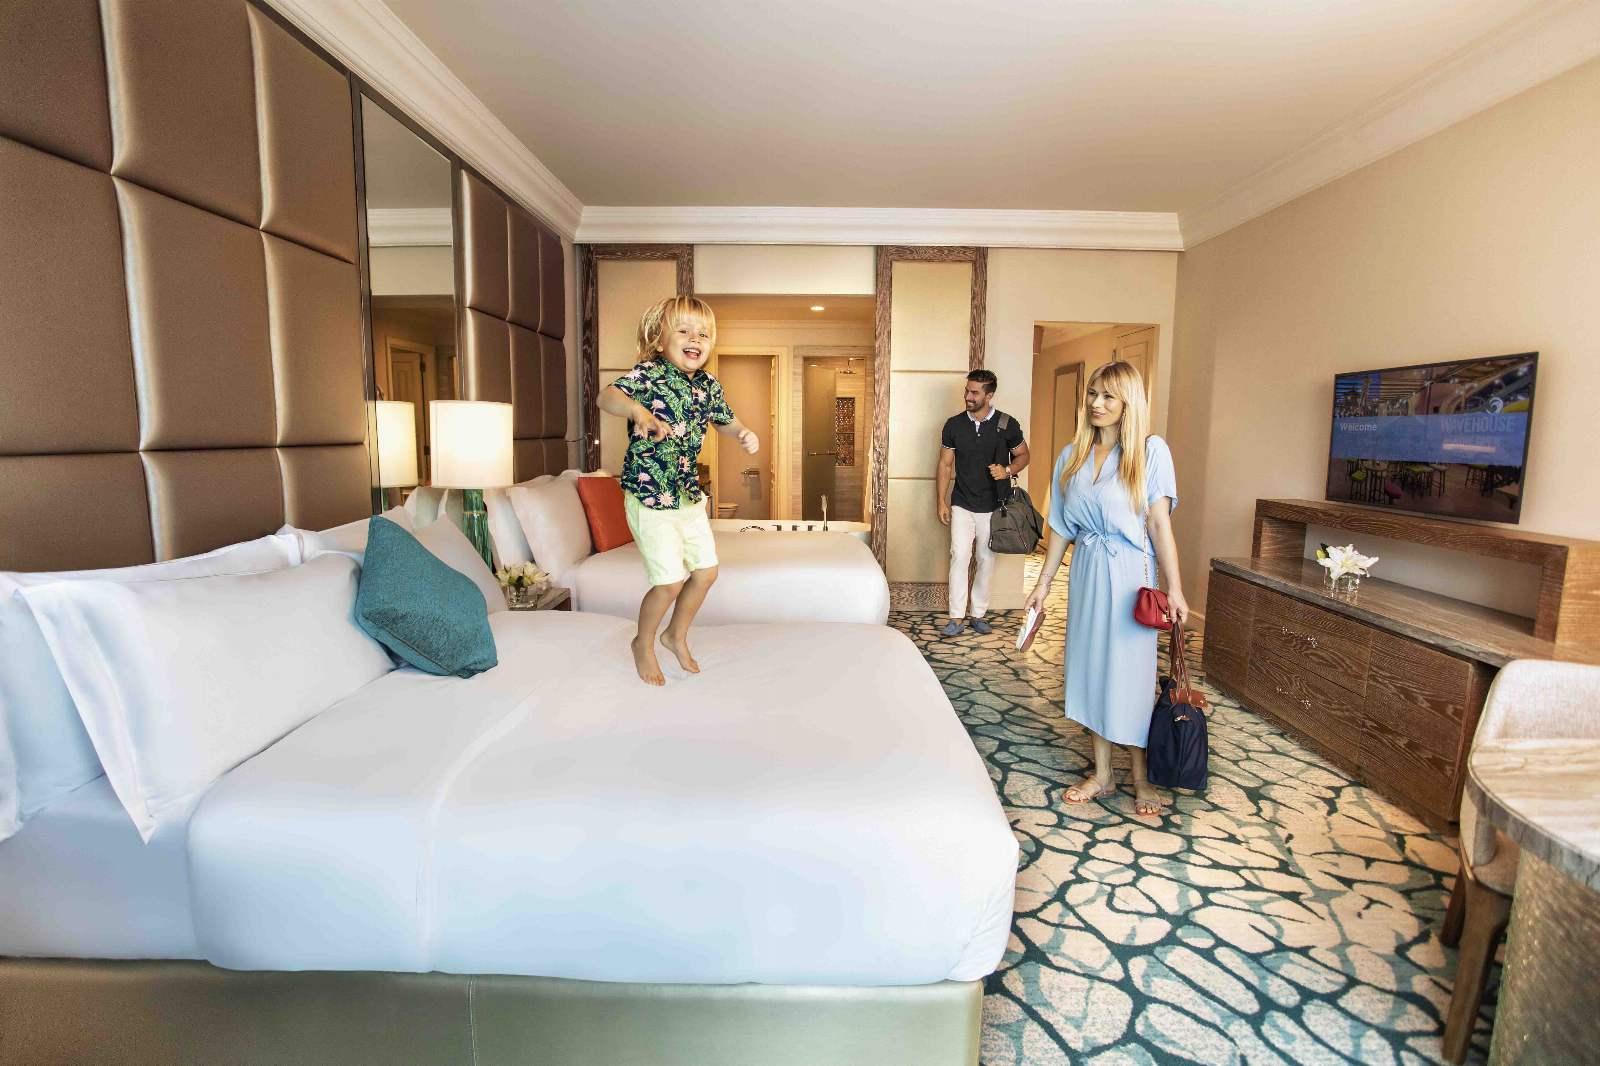 Atlantis, The Palm Ocean Deluxe Room